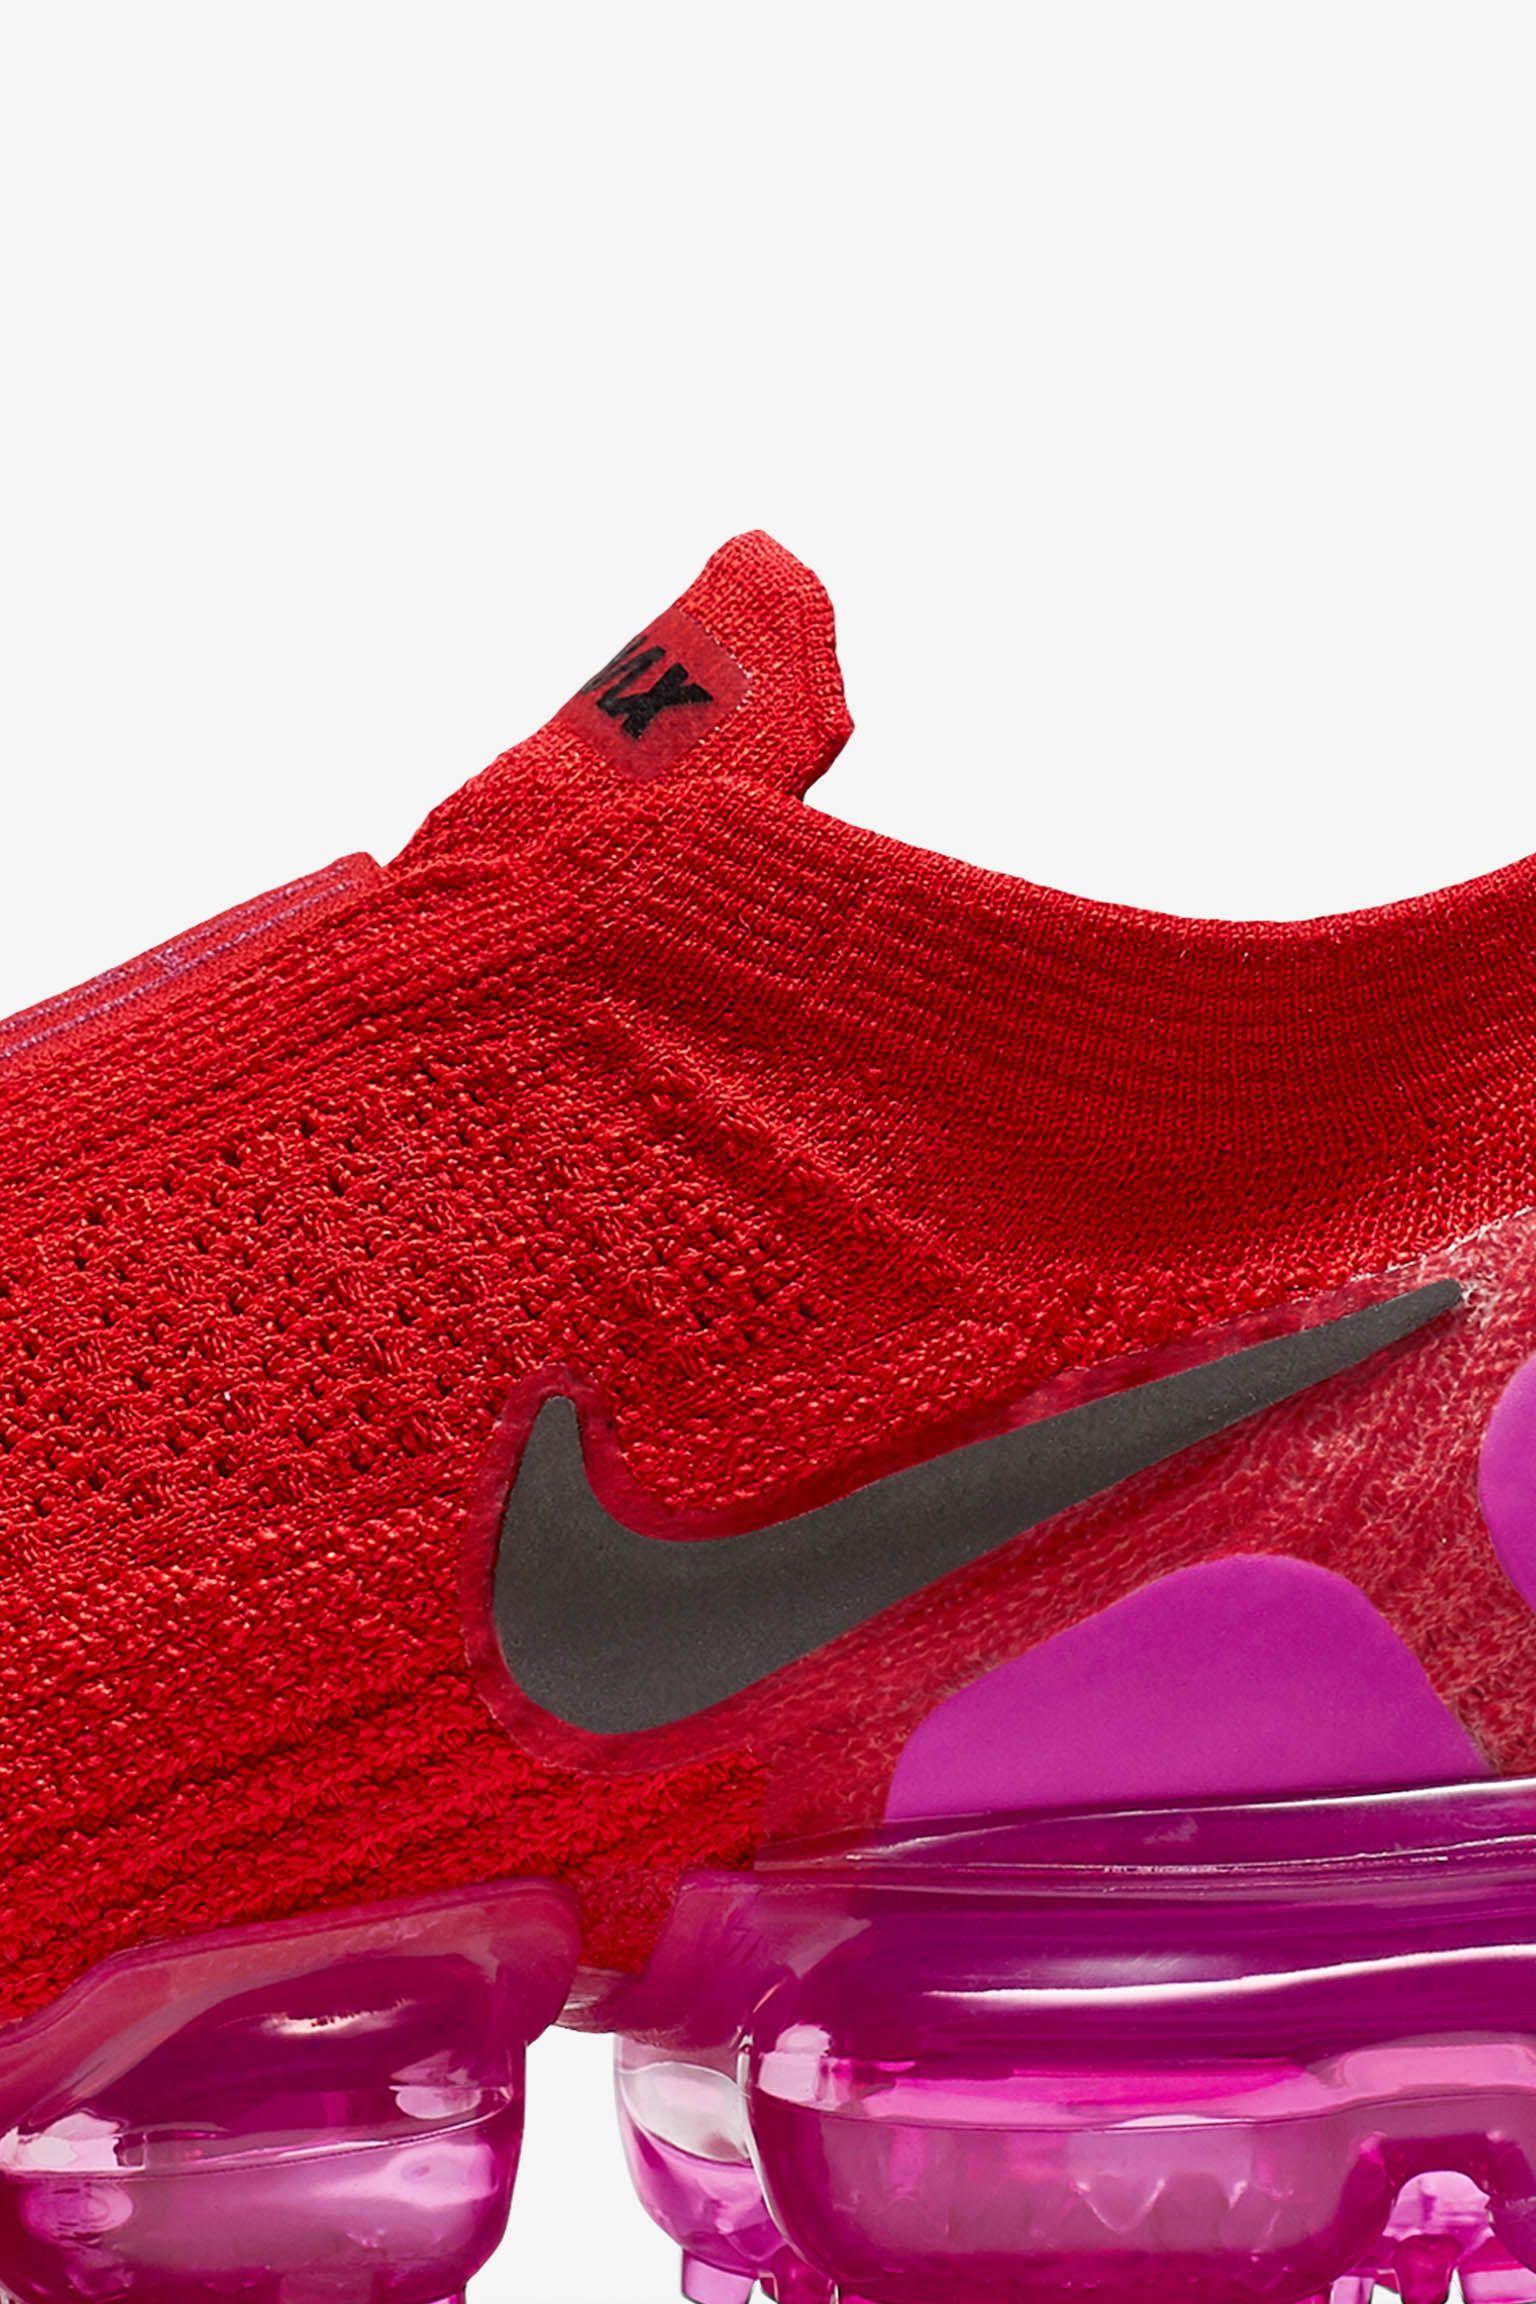 Nike Women's Air Vapormax Moc 2 'University Red & Fuchsia Blast' Release Date